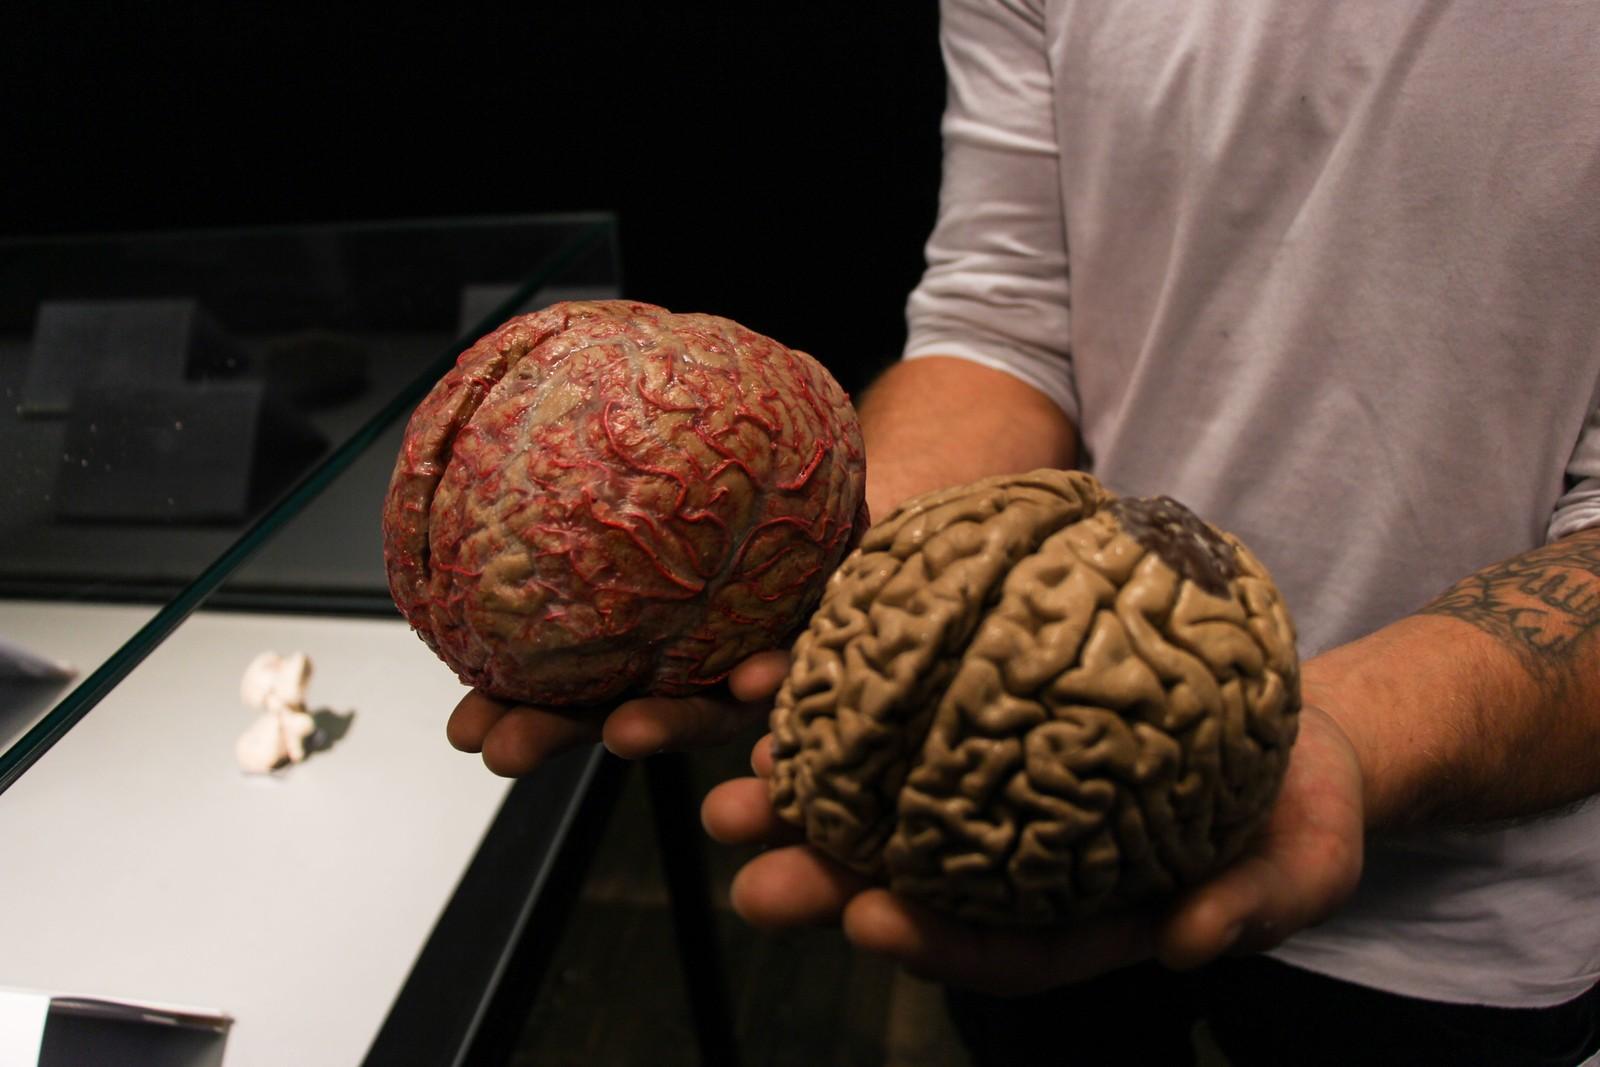 Til venstre er en frisk hjerne og til høyre er en hjerne fra menneske med alzheimer.